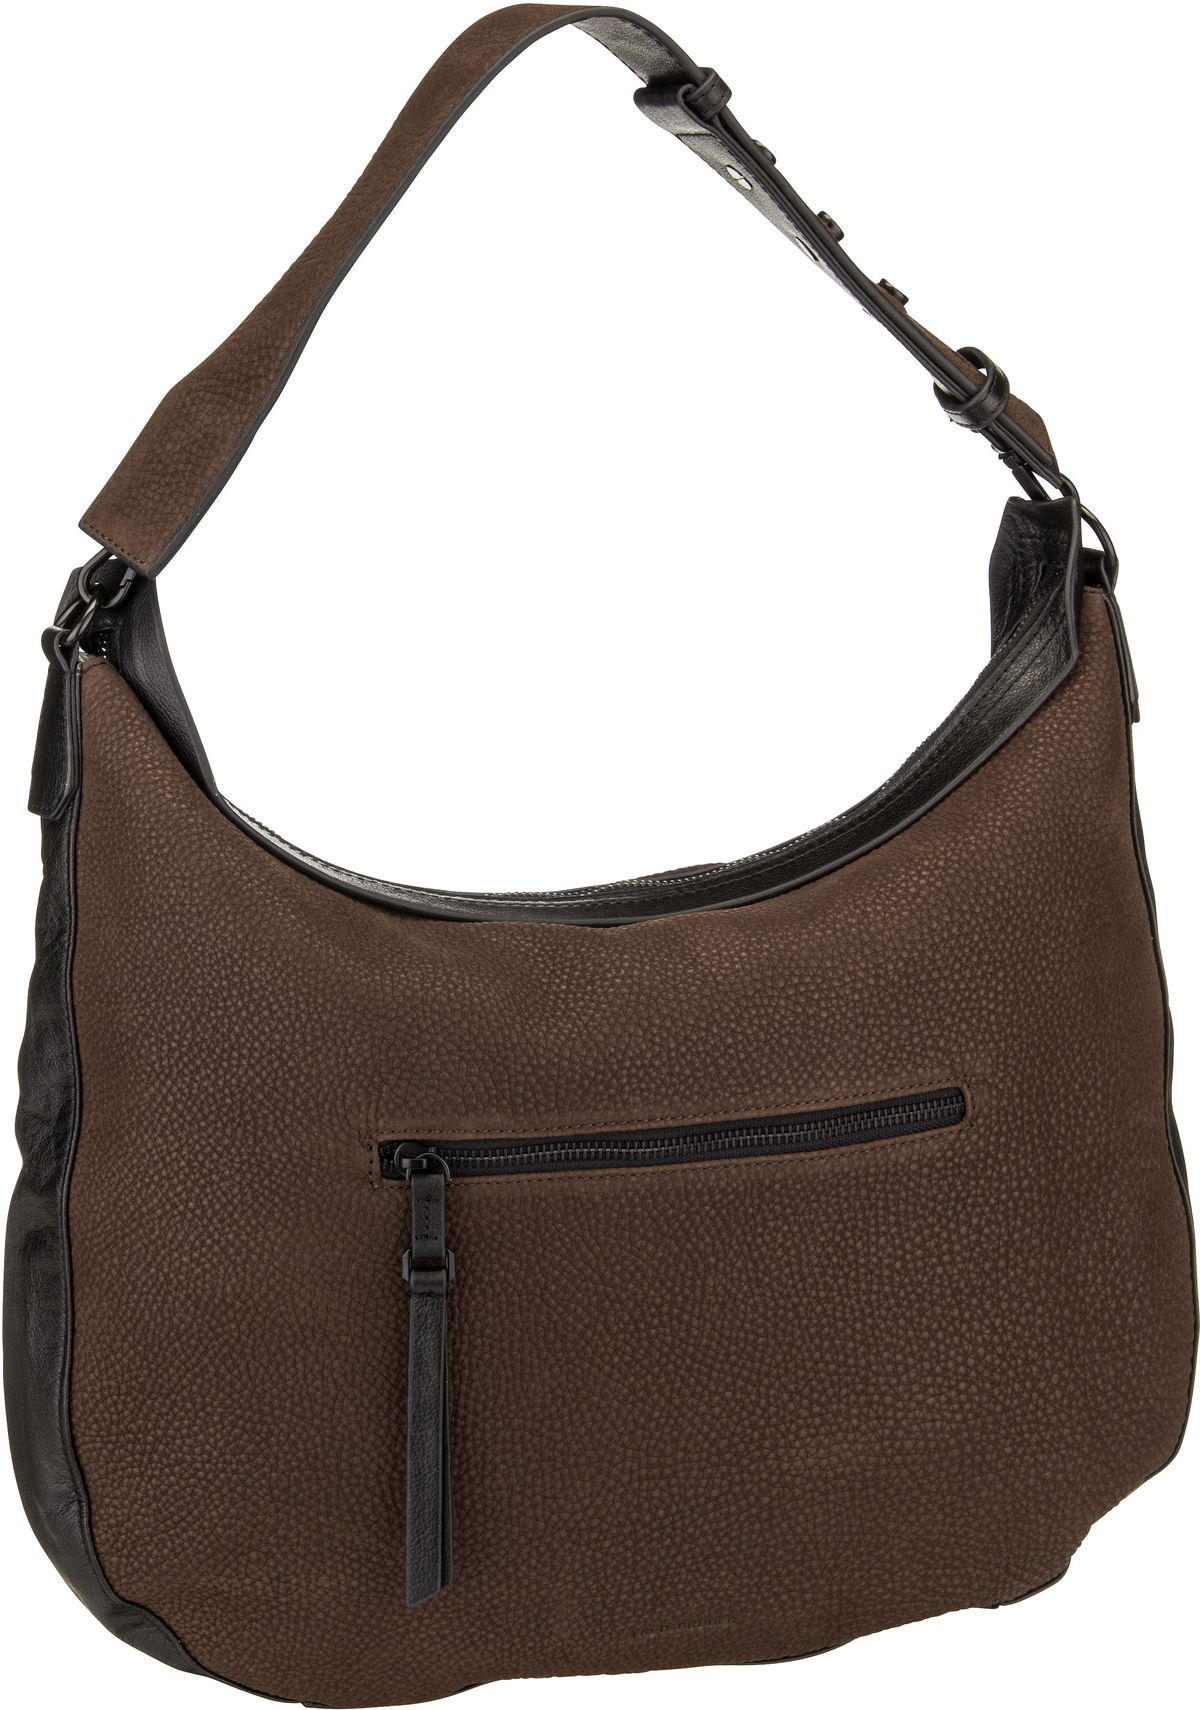 Handtasche Heartbeat Brown